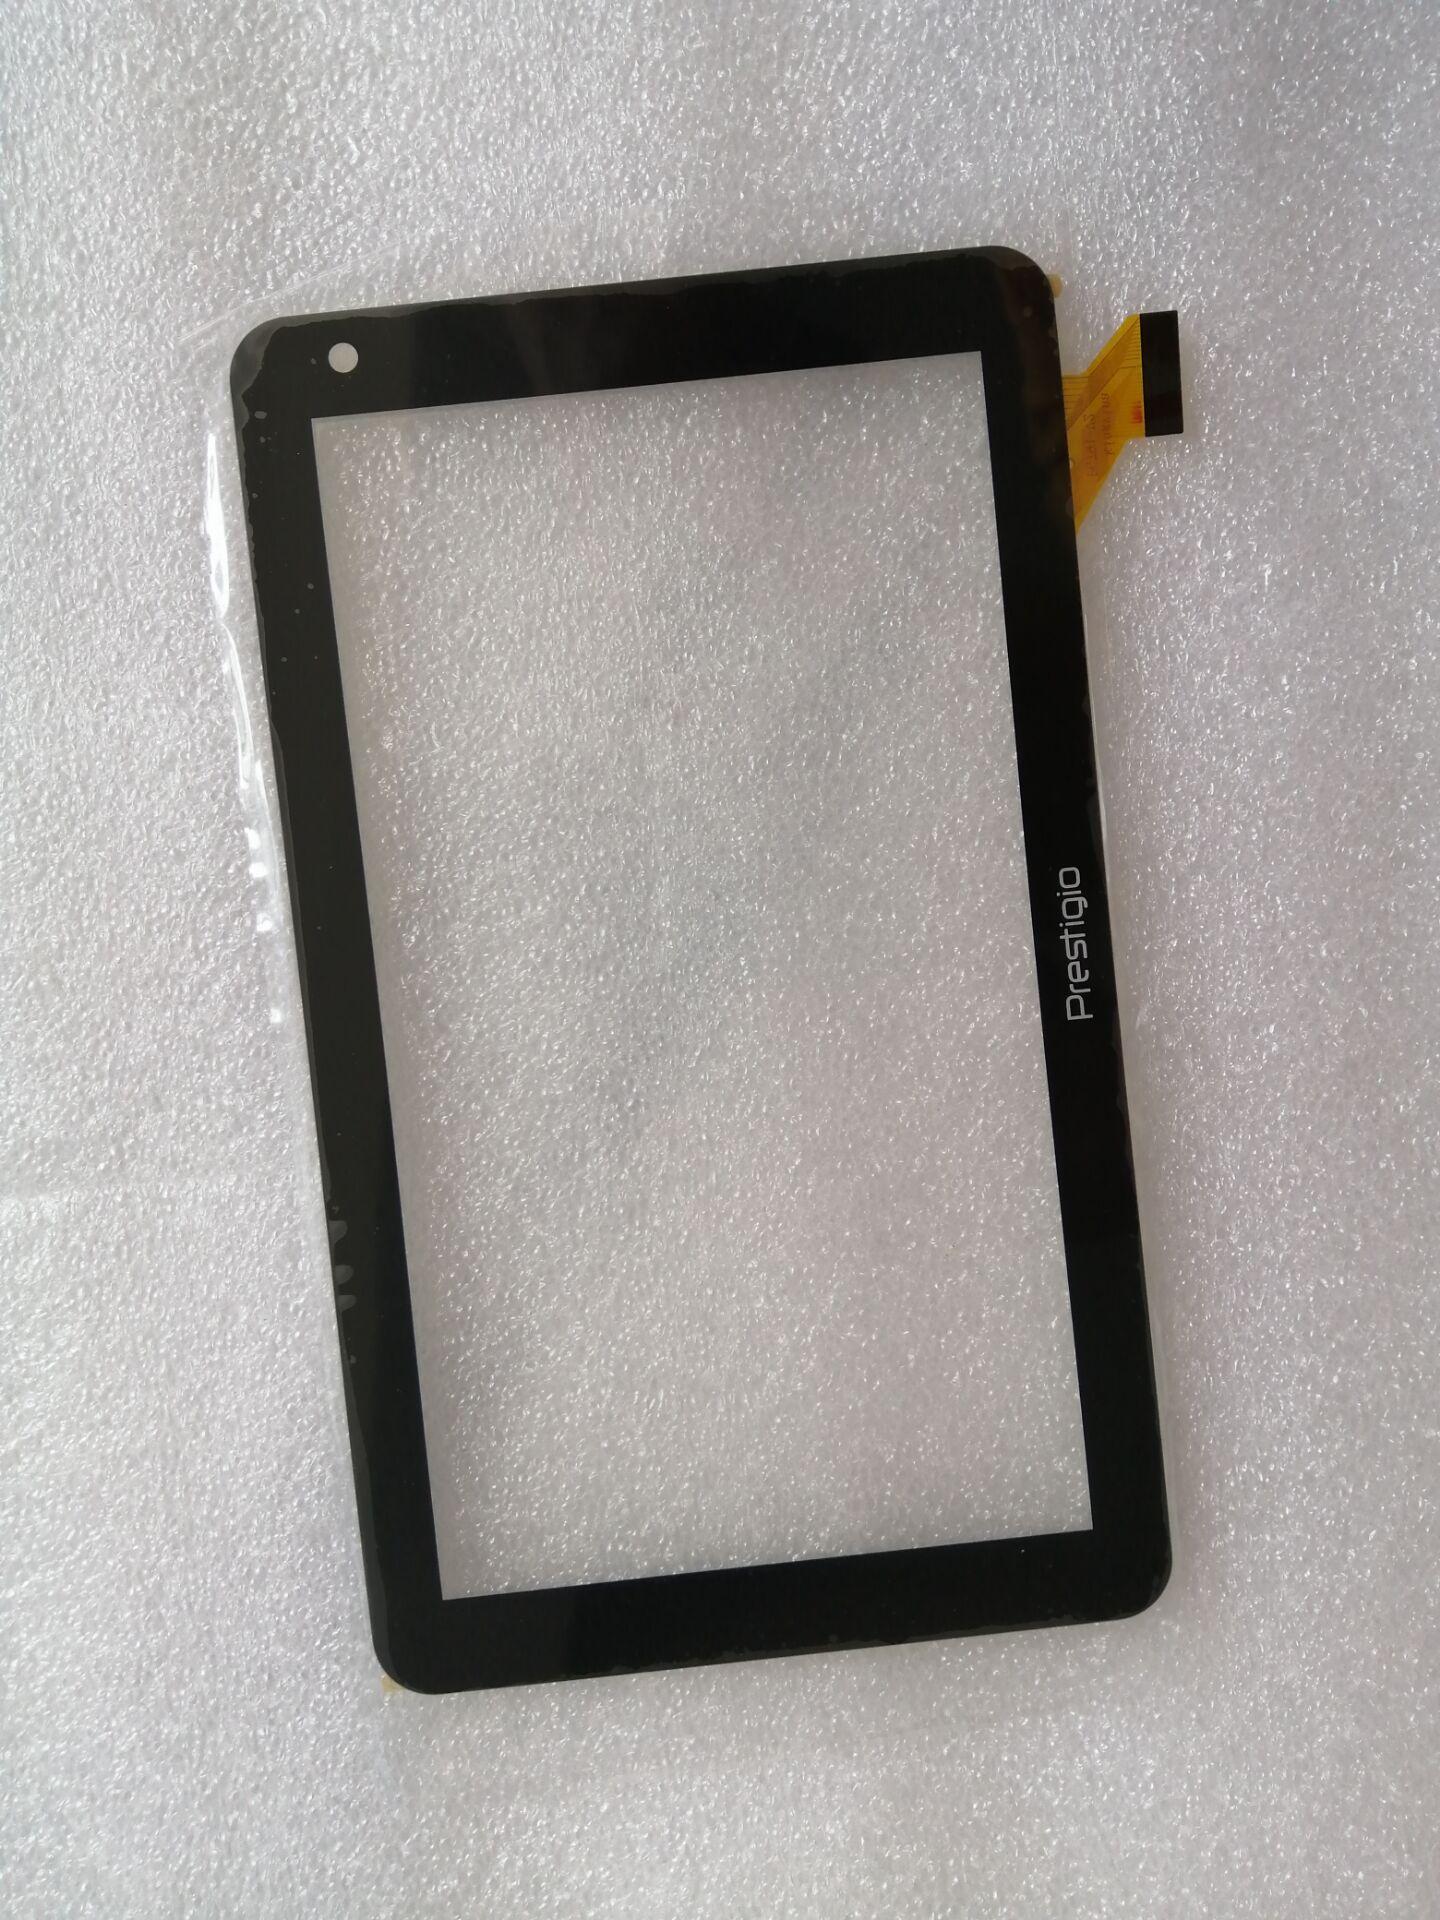 Witblue  7'' New Touch Screen For Prestigio Smartkids PMT3997 Touch Panel Digitizer Glass Sensor